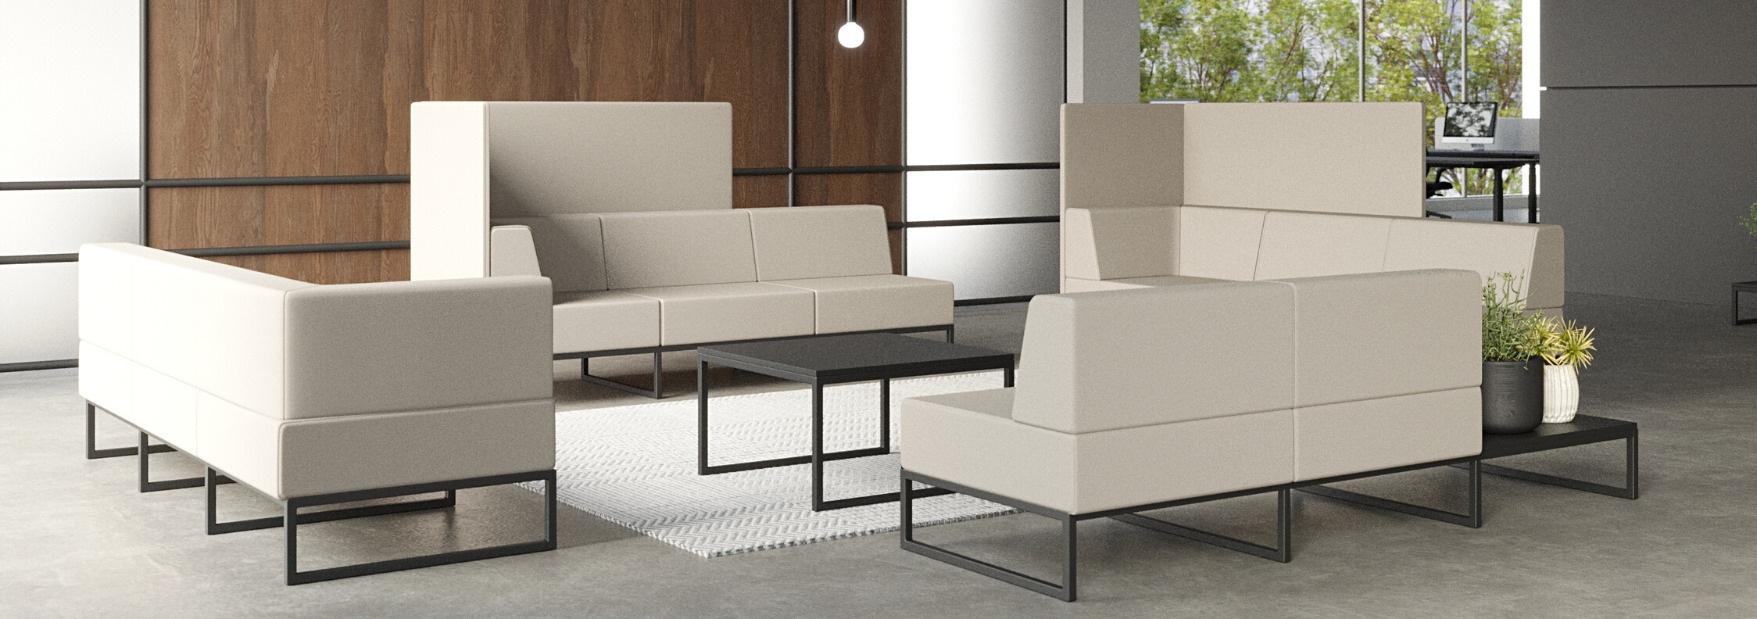 Bejot-PLINT-3-Sitzer-Modulsofa-Akustiksofa-mit-hohen-Ruckwanden